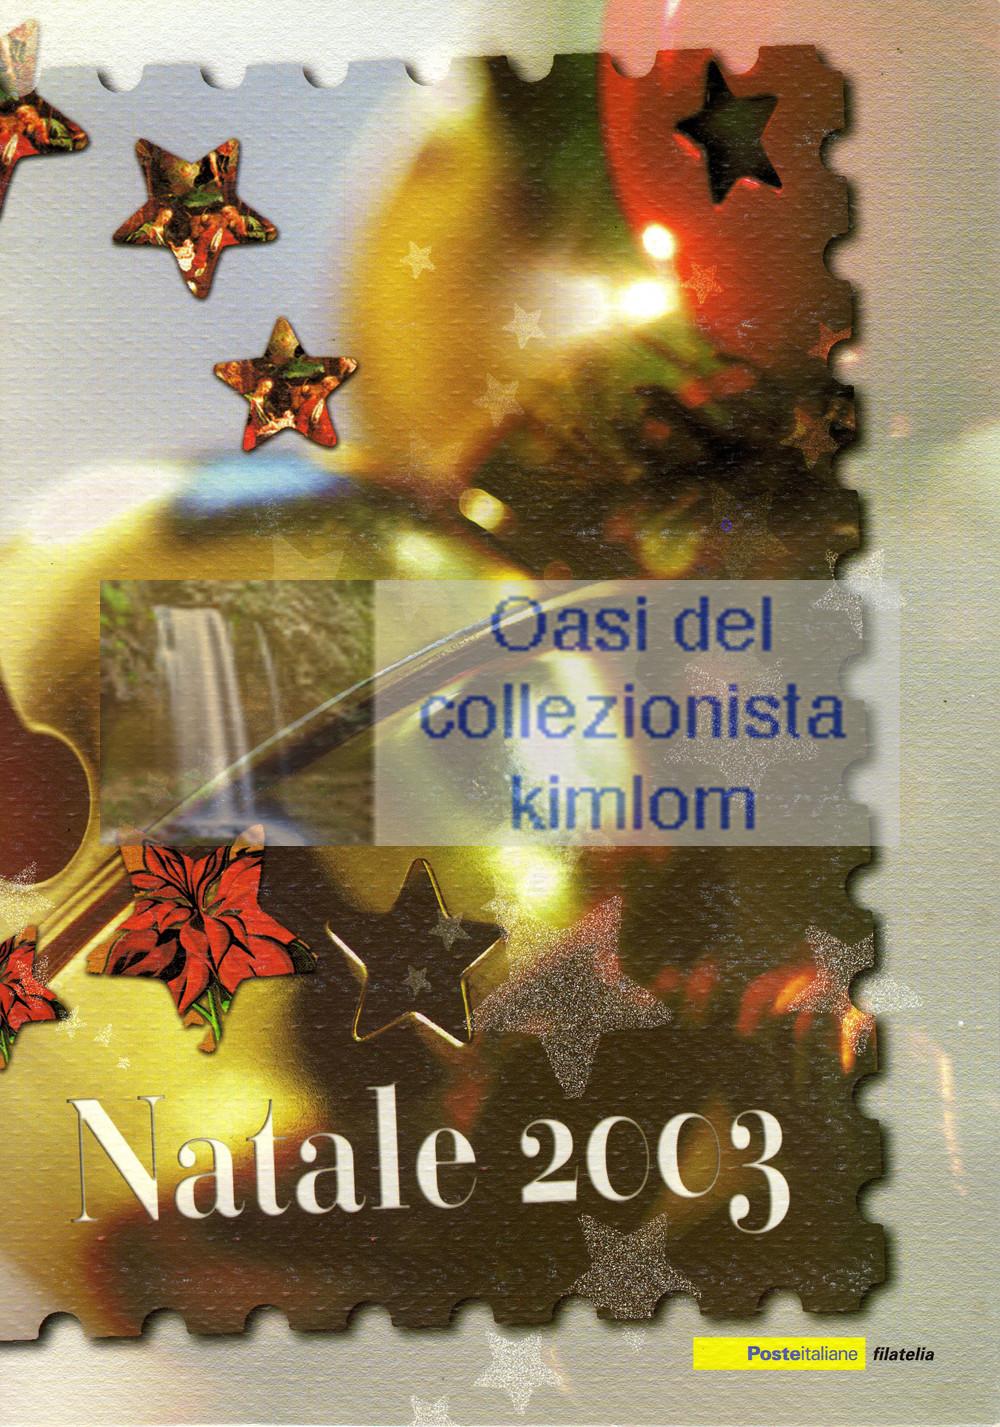 folder - Natale 2003